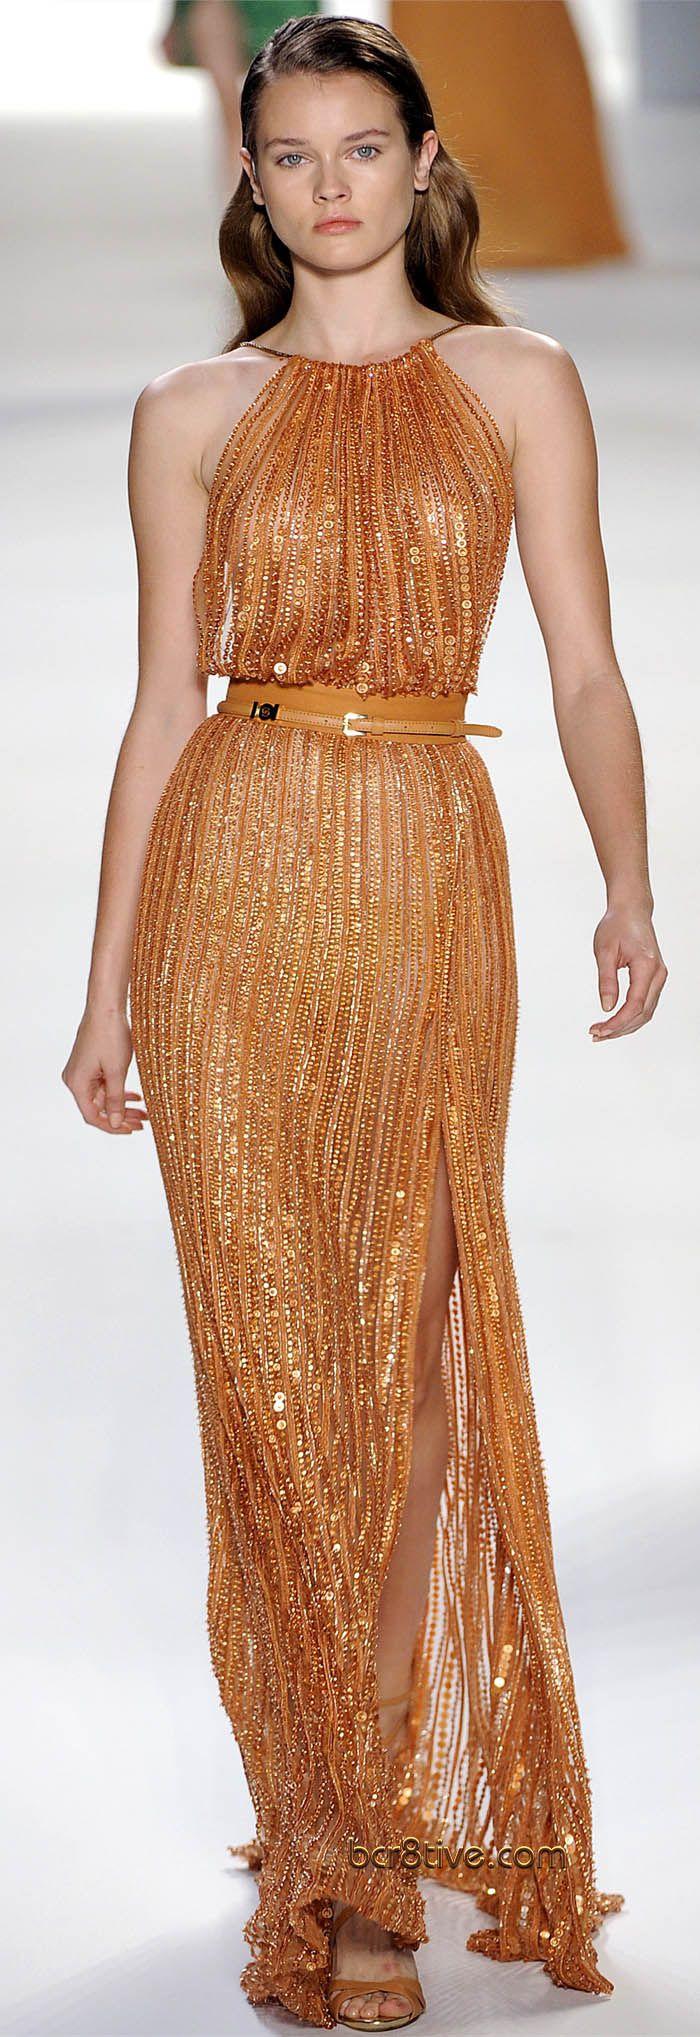 2260 best GRIFFE ELIE SAAB images on Pinterest   Clothing apparel ...